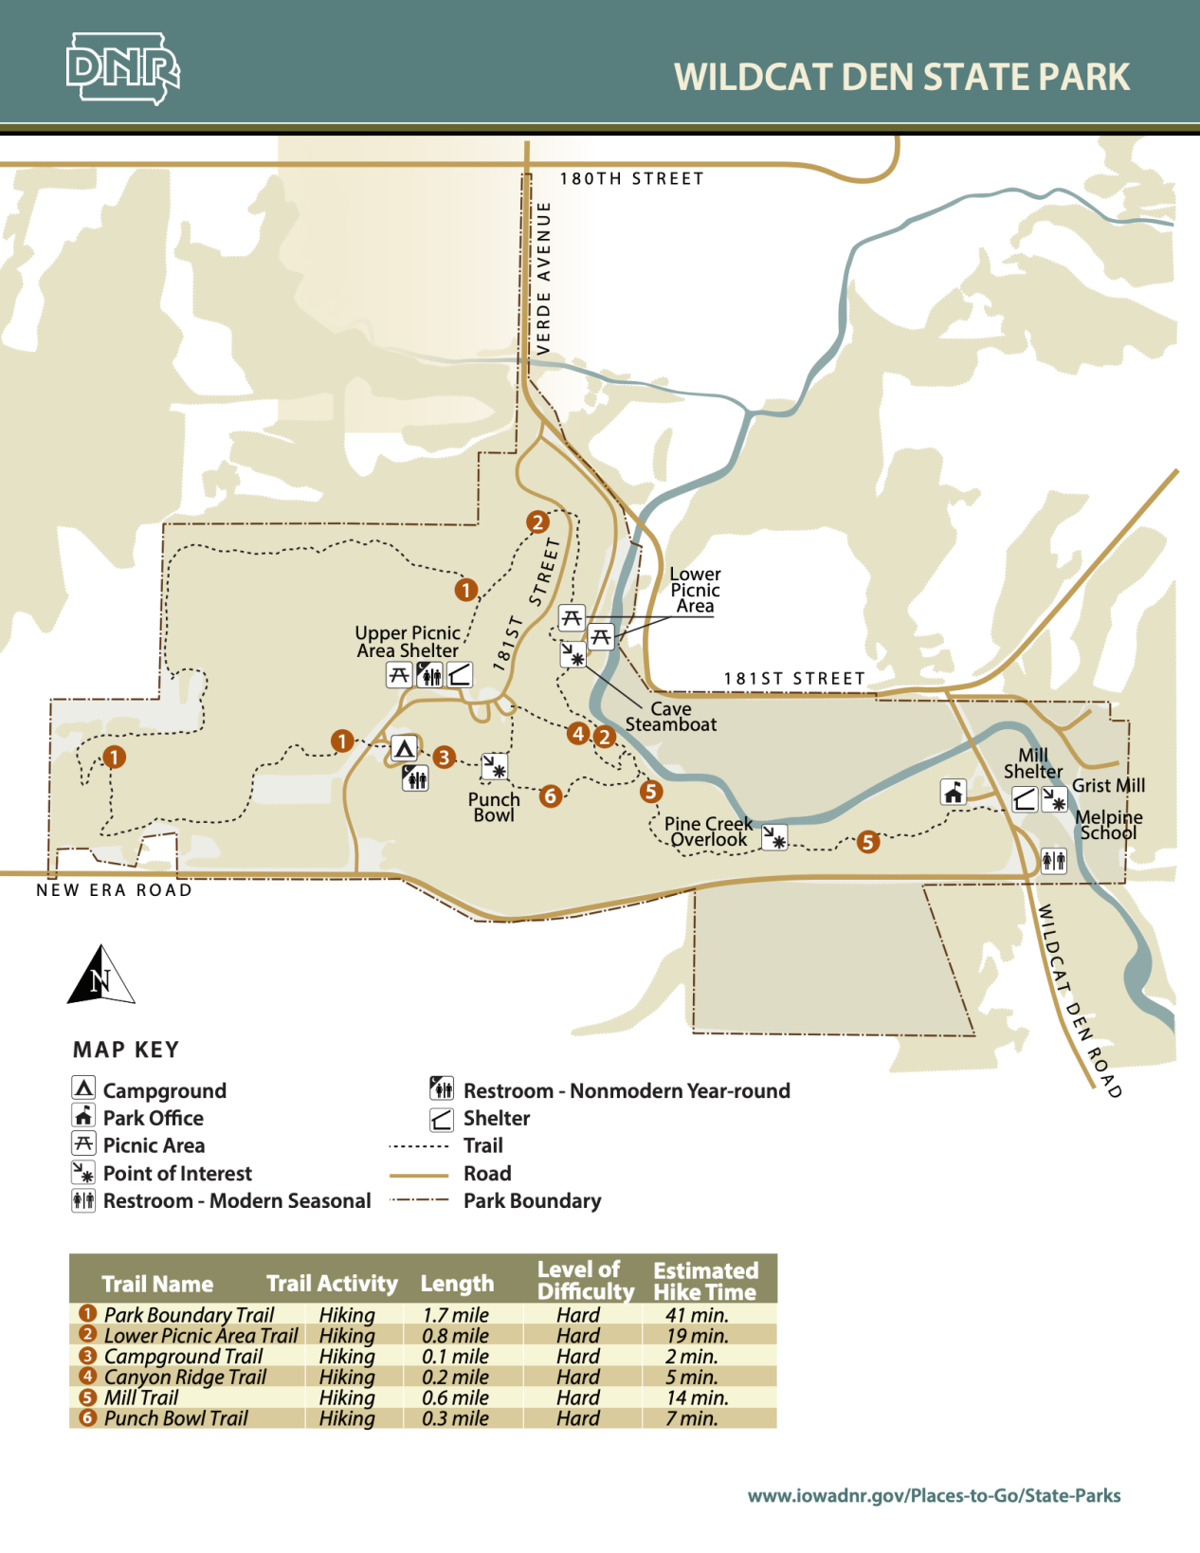 Wildcat Den State Park Map